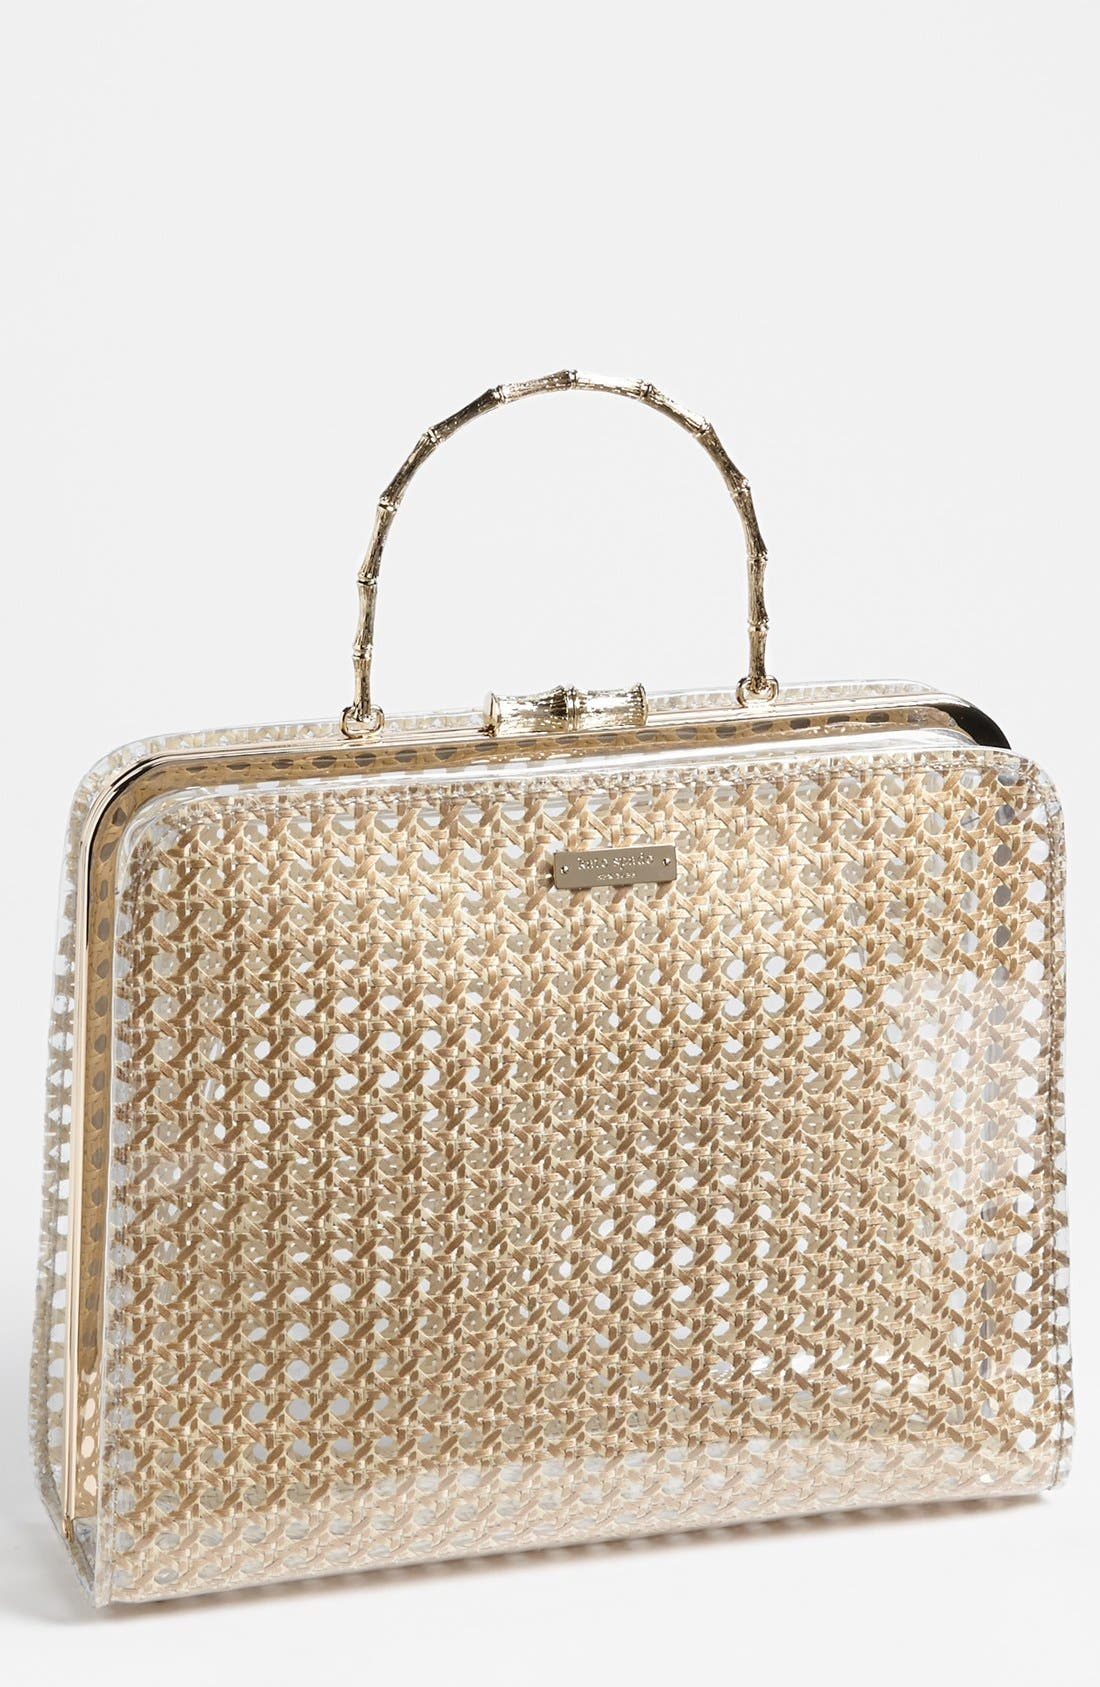 Alternate Image 1 Selected - kate spade new york 'summer house - sylvia' handbag